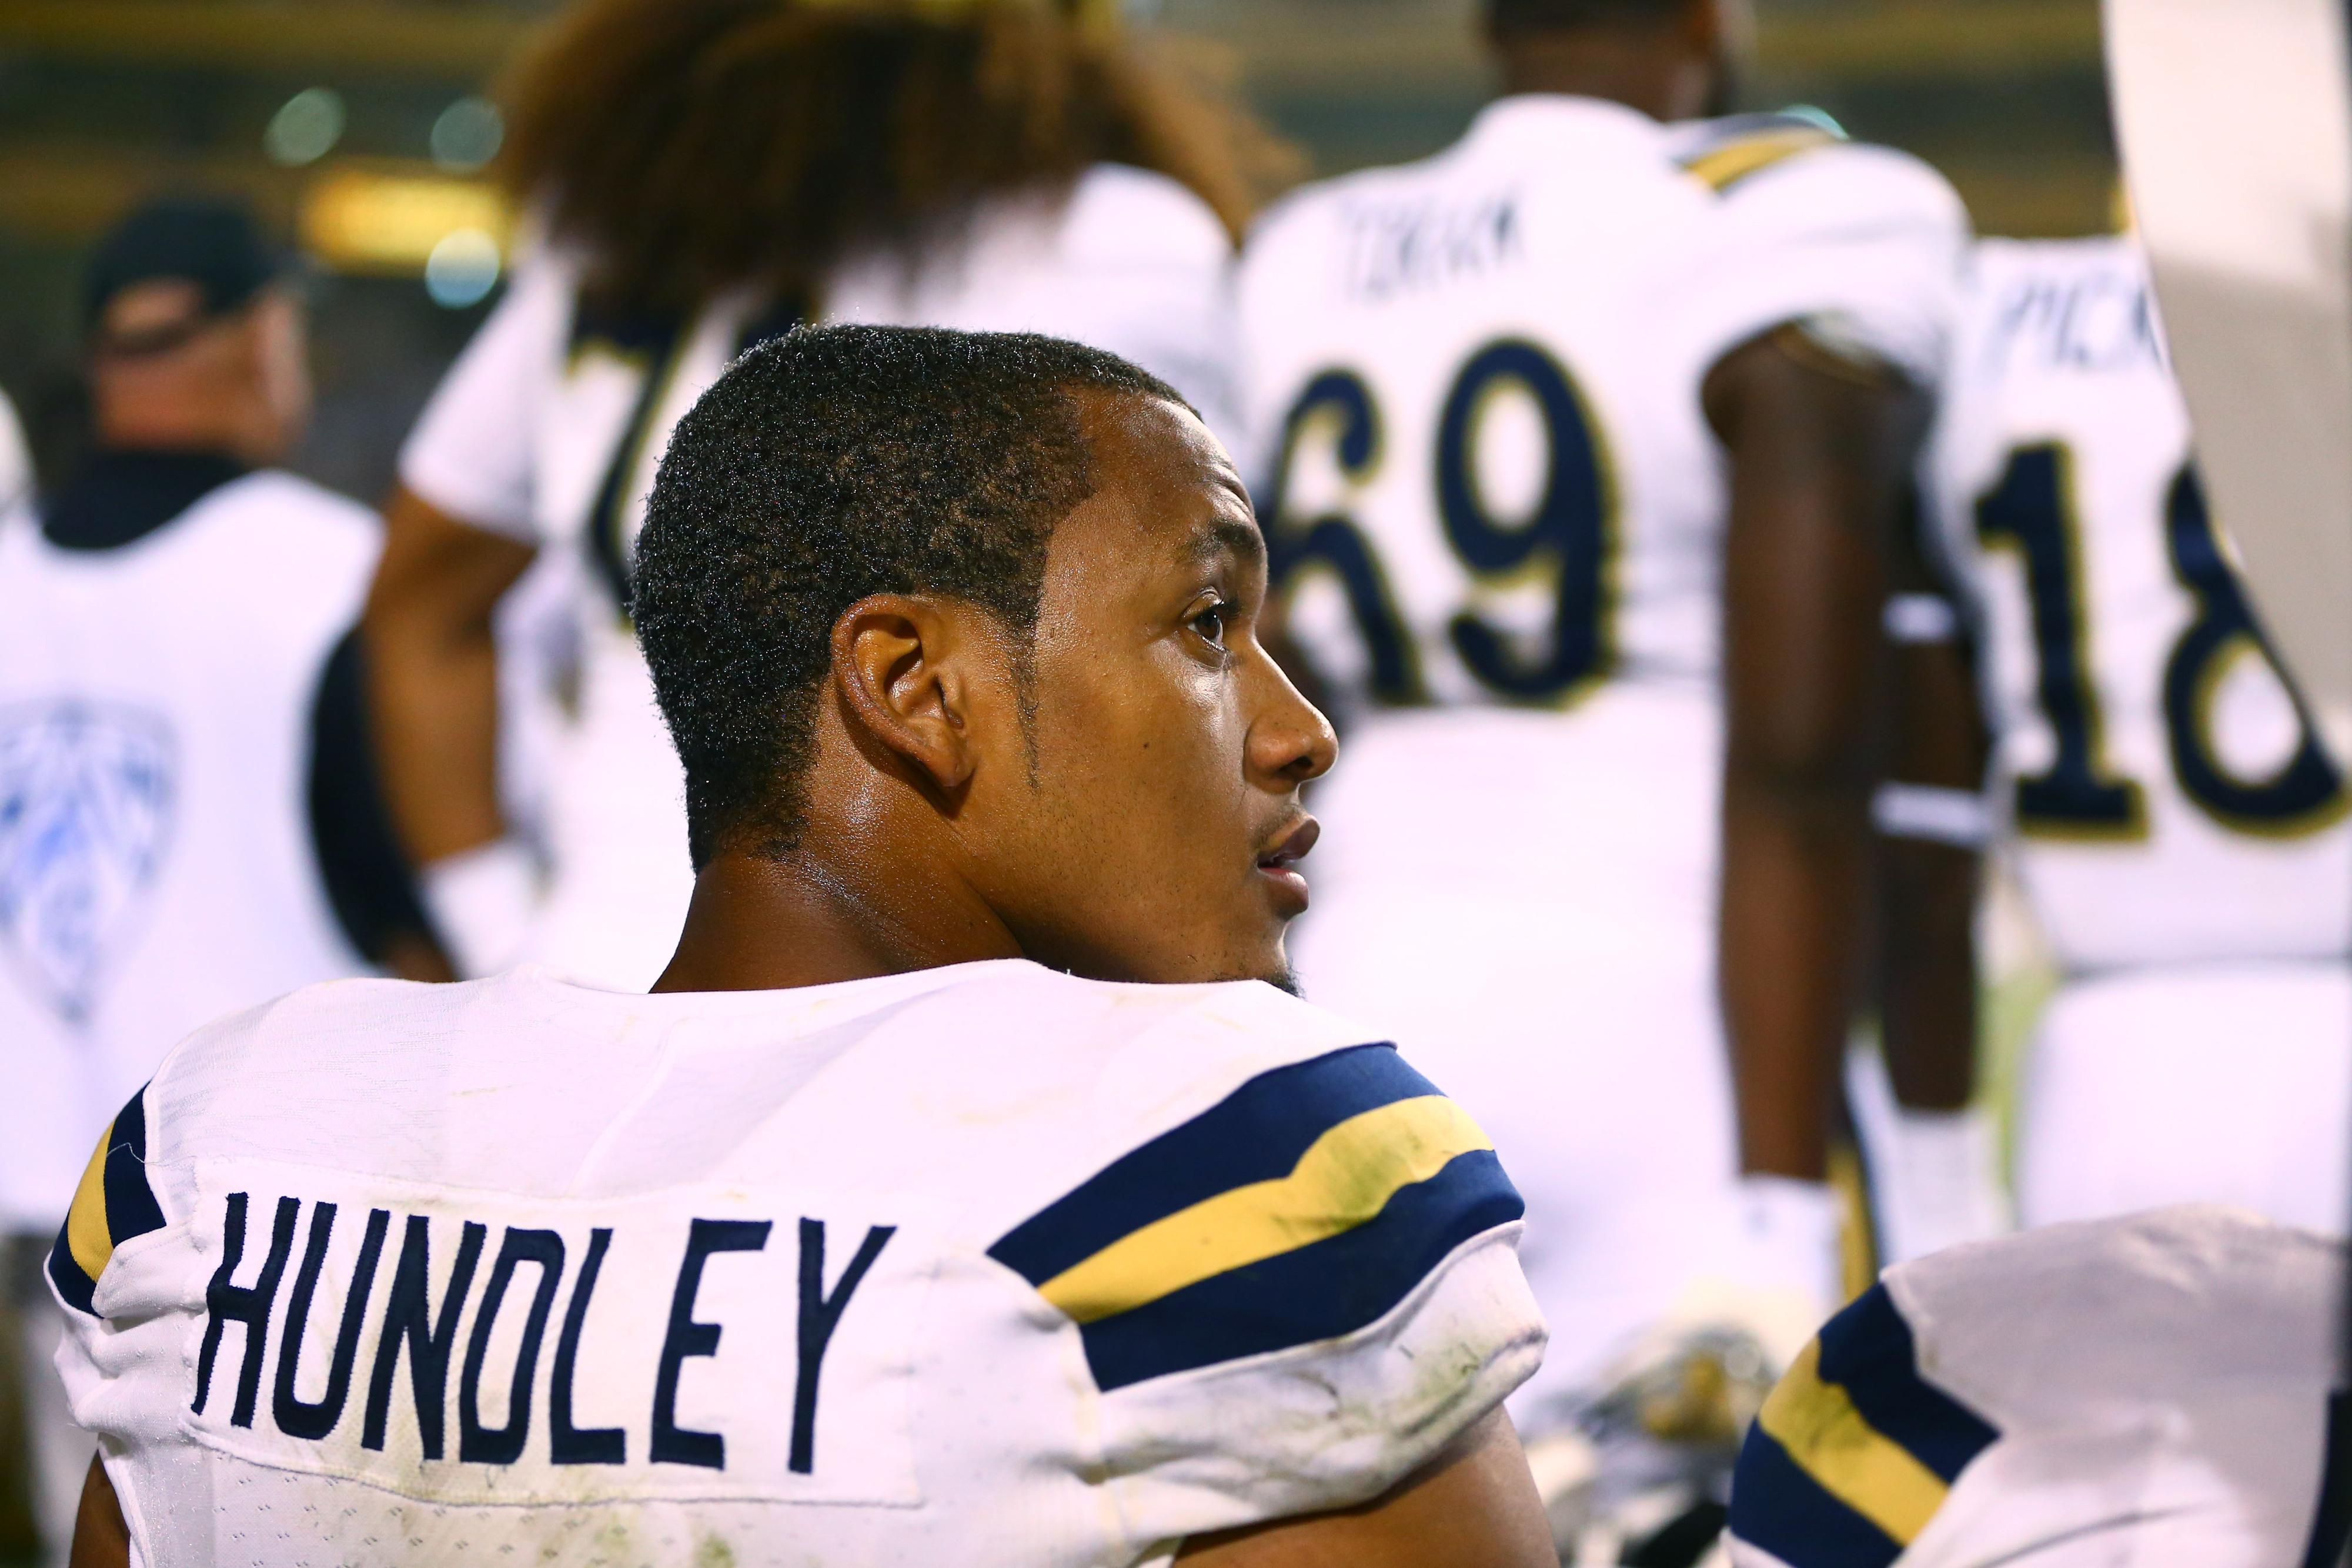 UCLA QB Brett Hundley ponders what number he'll wear for the Texans next season